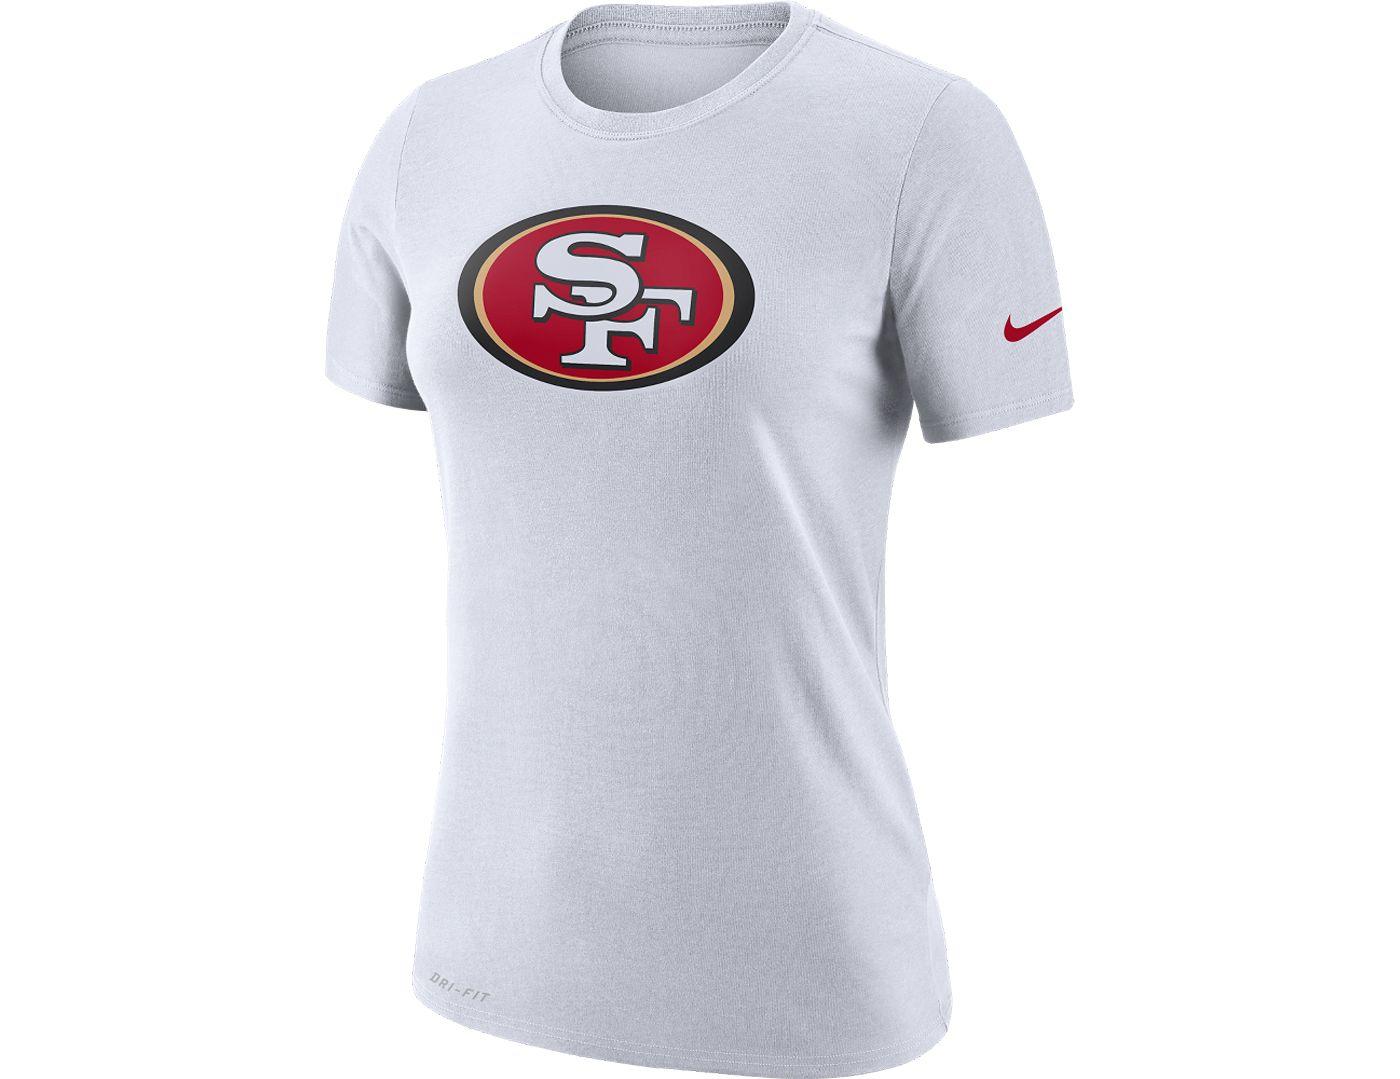 Nike Women's San Francisco 49ers Logo Dri-FIT Performance White T-Shirt